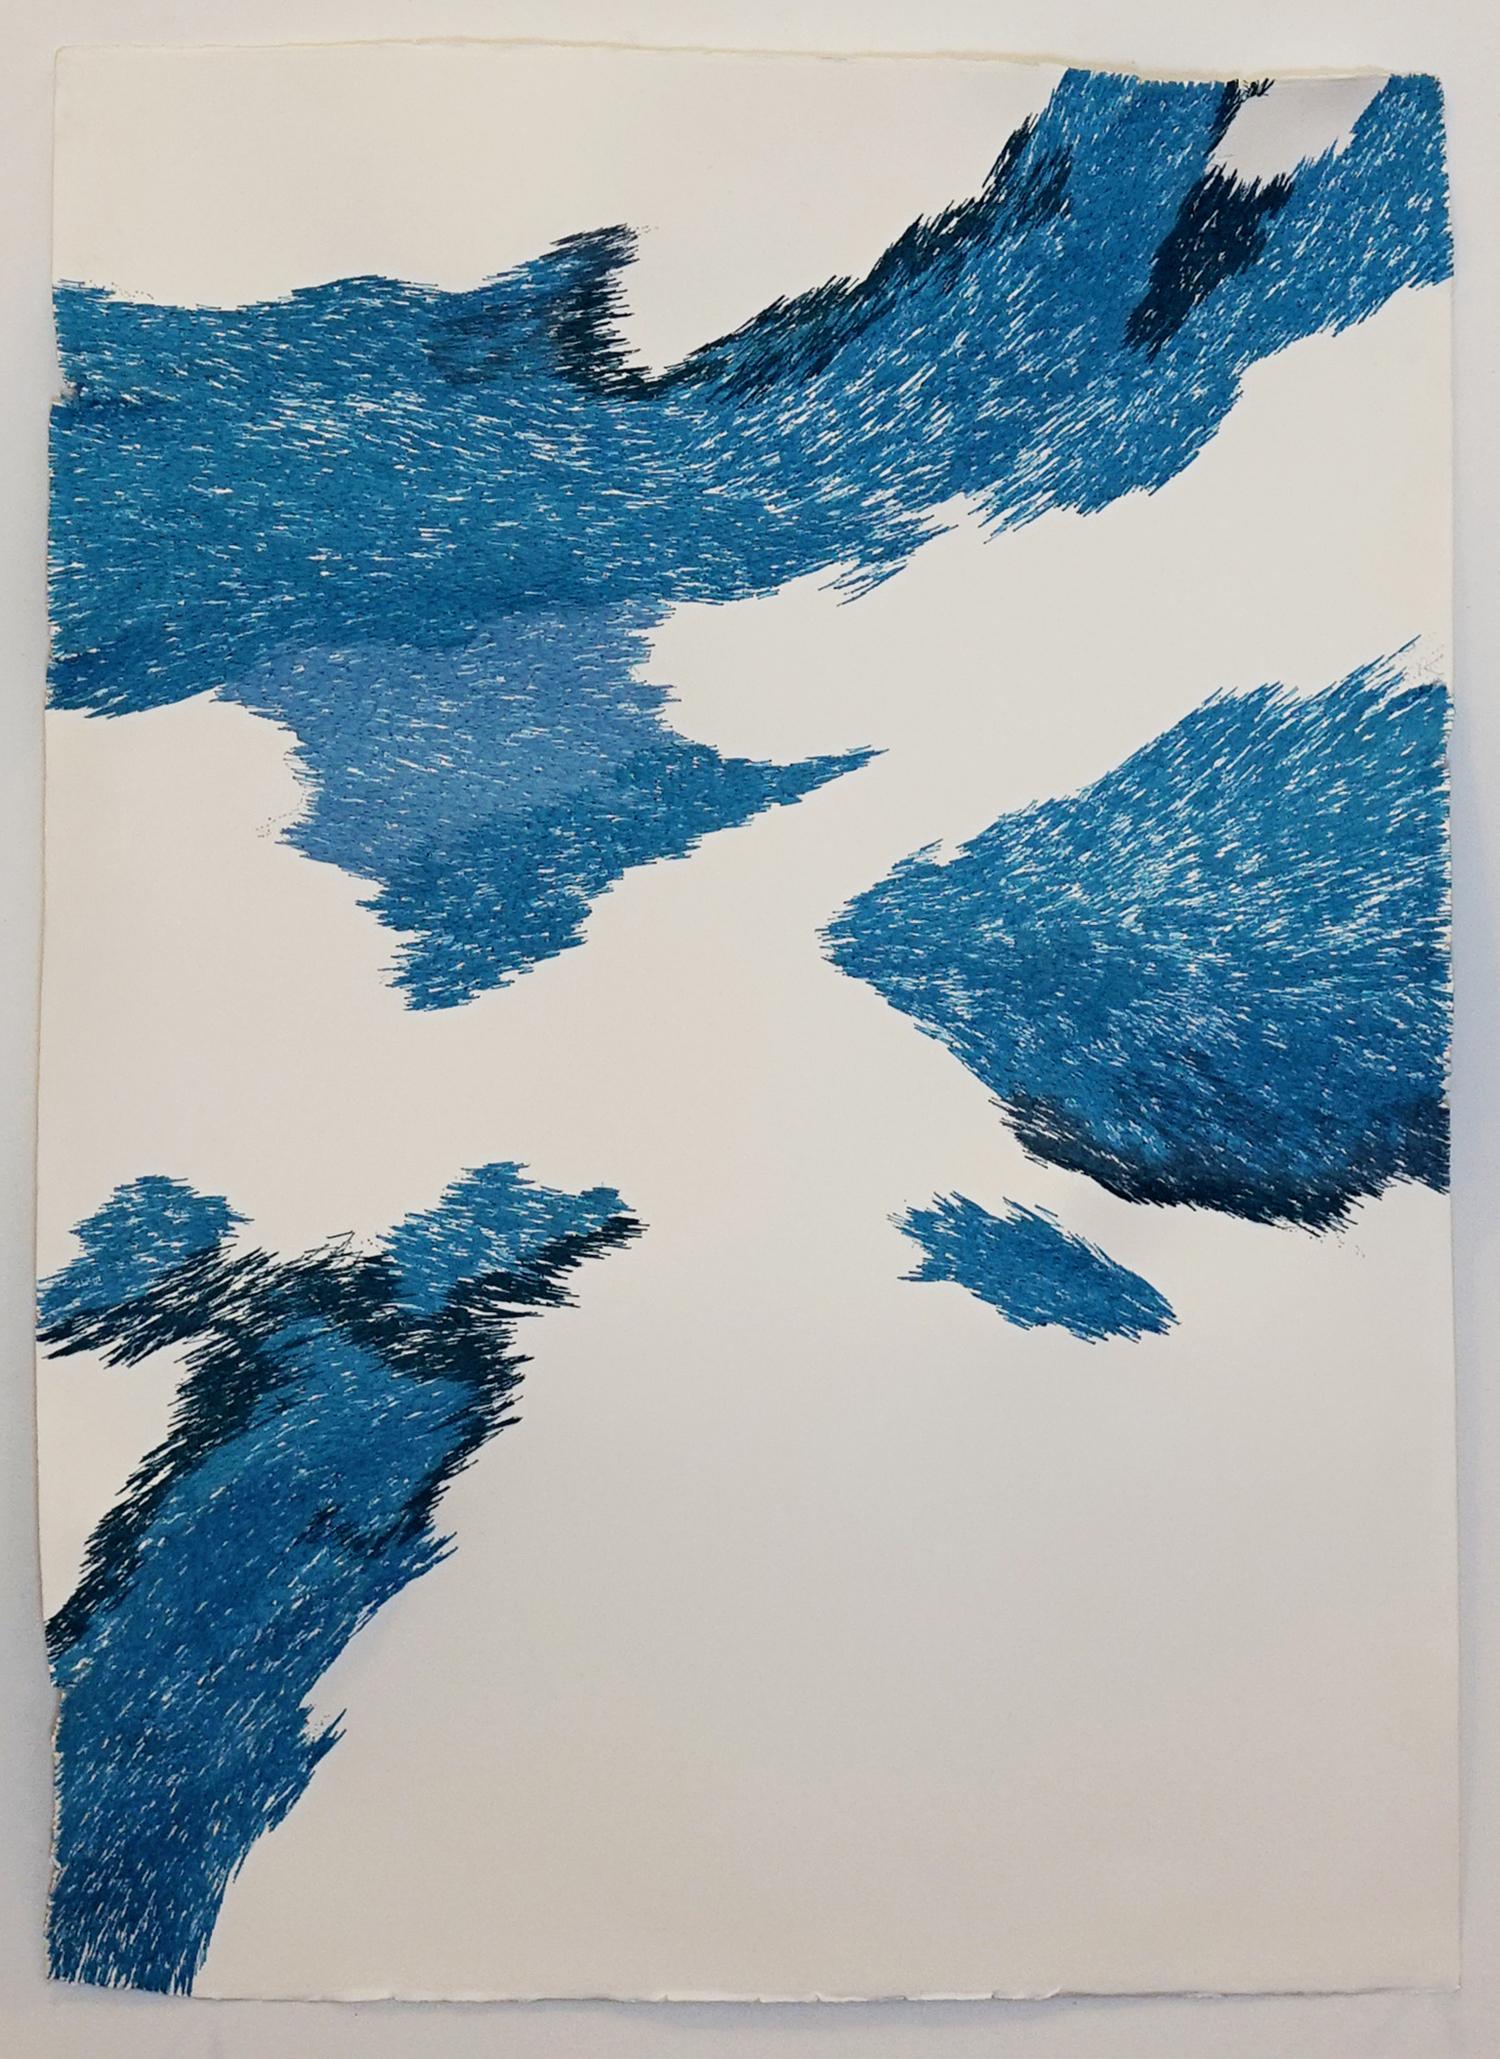 105-32-Henson_Untitled(Blue).jpg